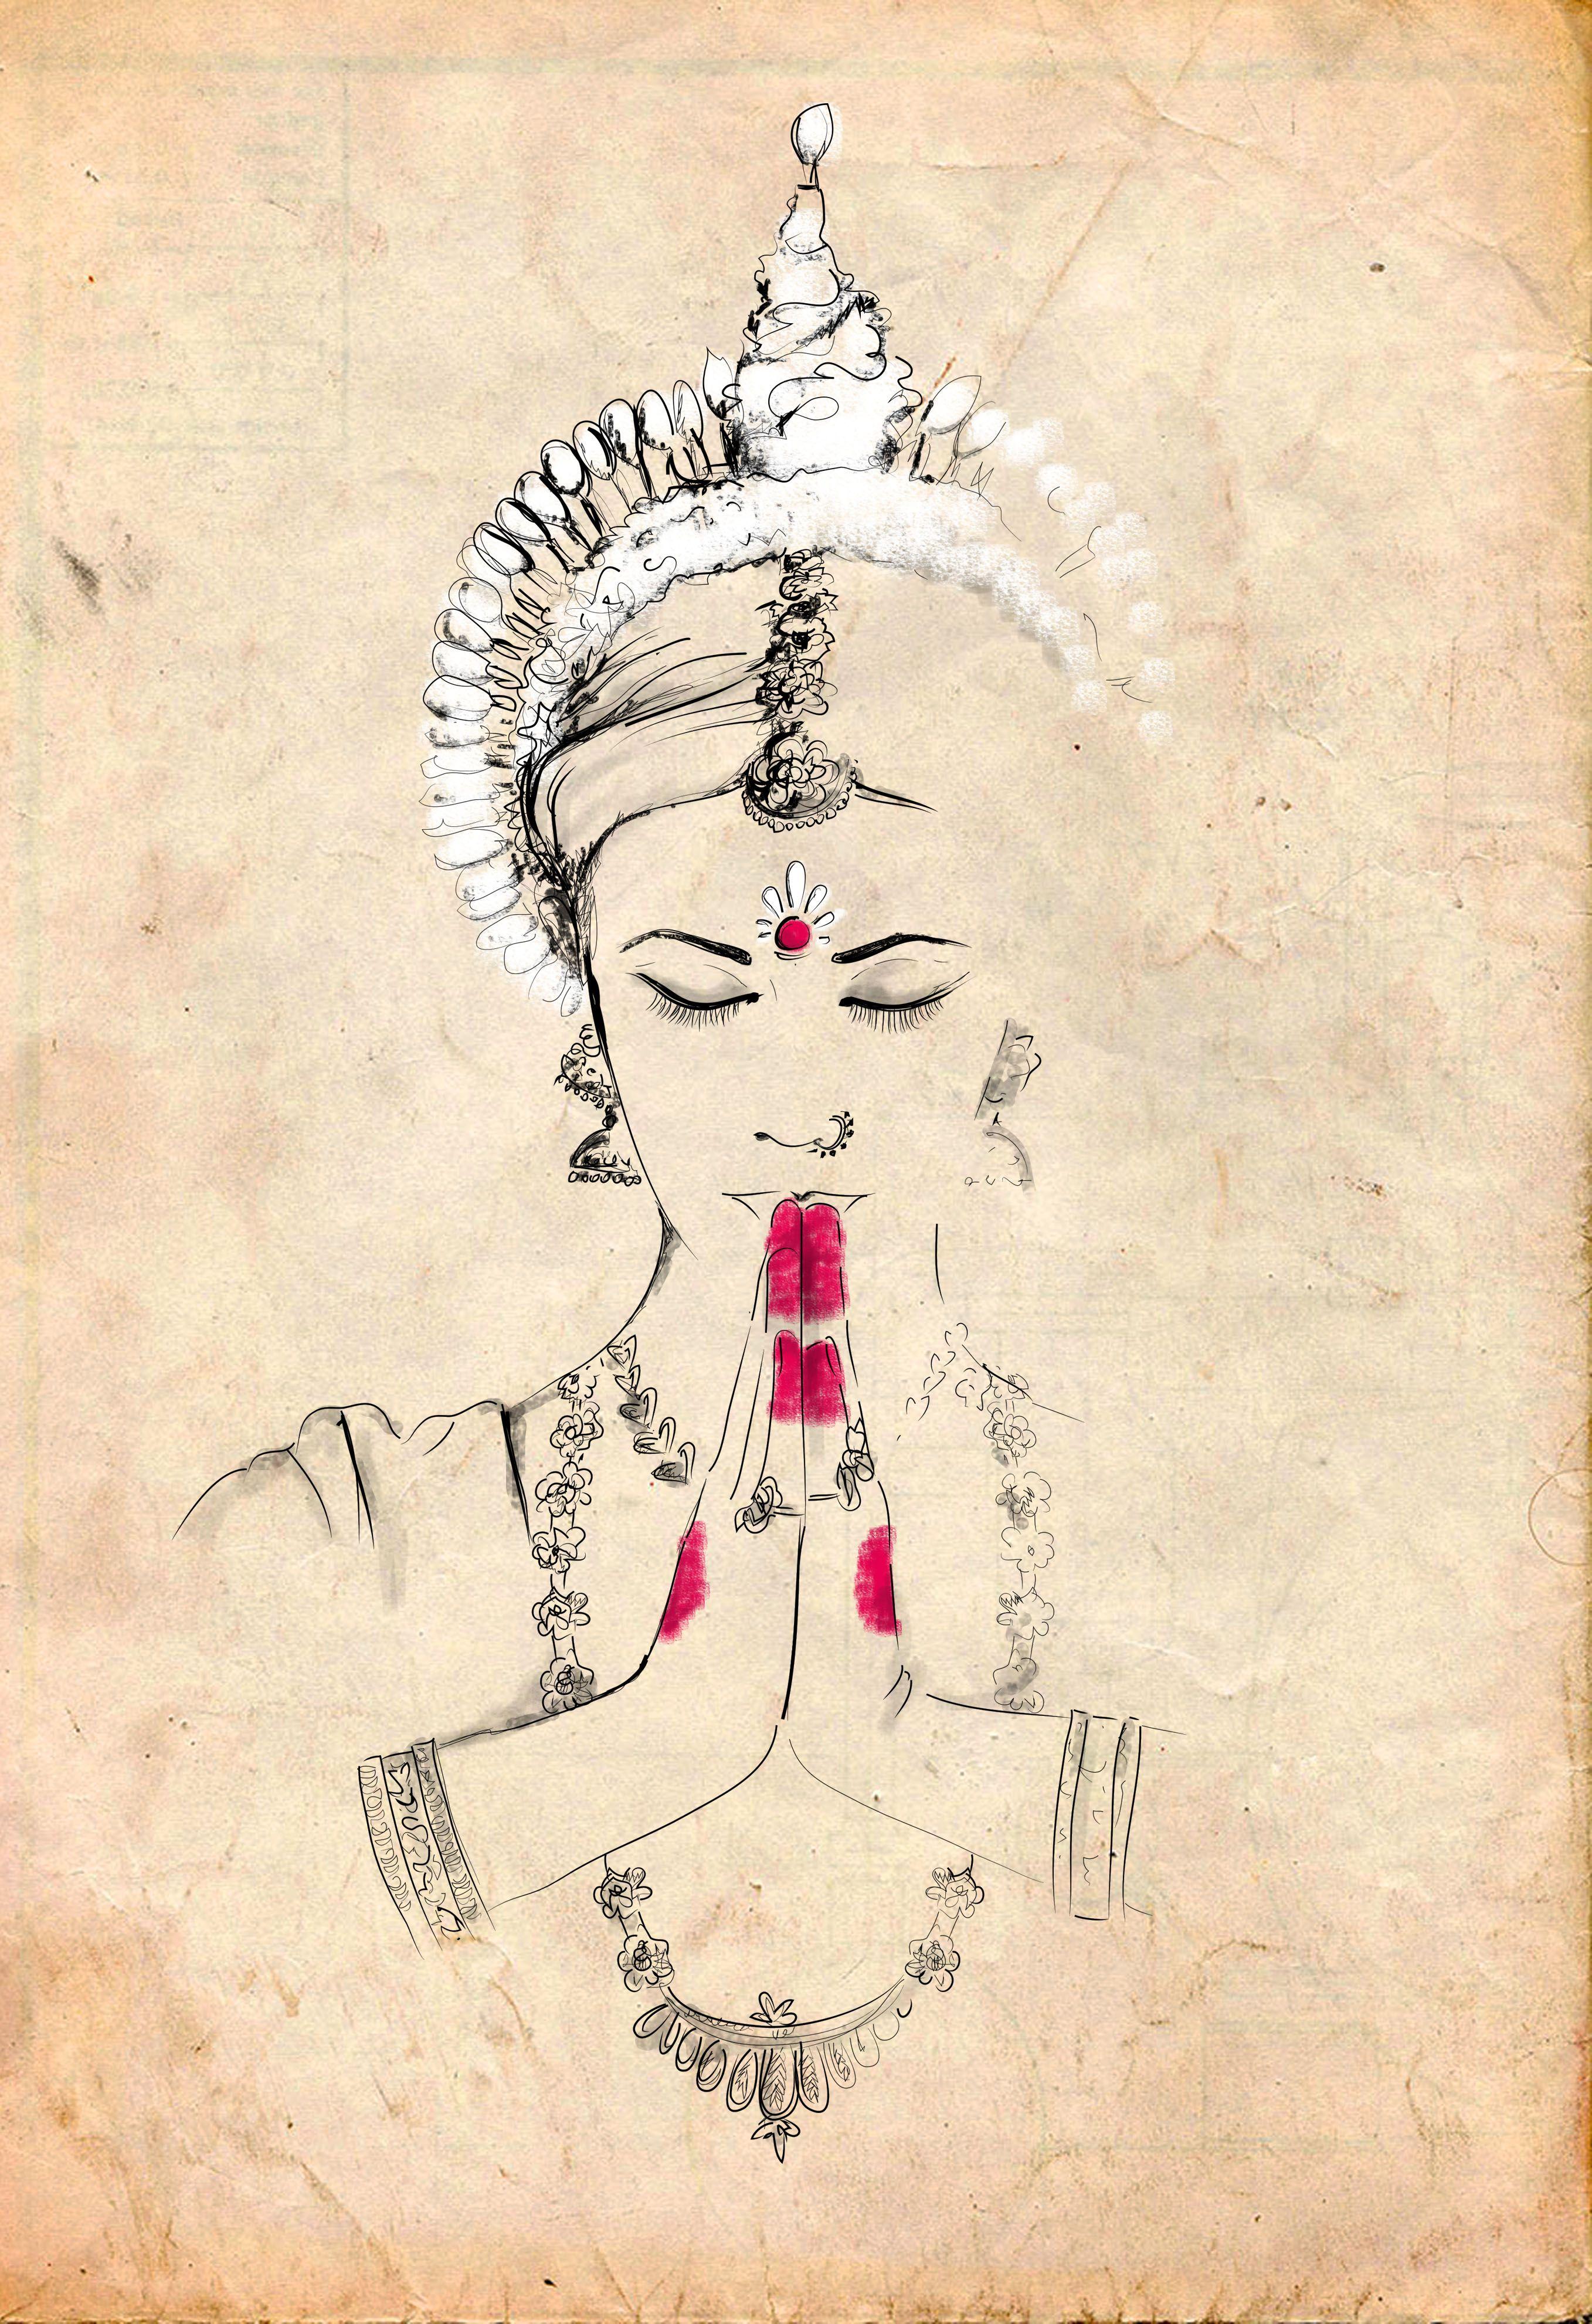 Odissi Illustration By Gungur Arts Gungur Indianfinearts Odissi Indianclassicaldance Woodpaper Illustrati India Art Indian Art Paintings Dance Paintings